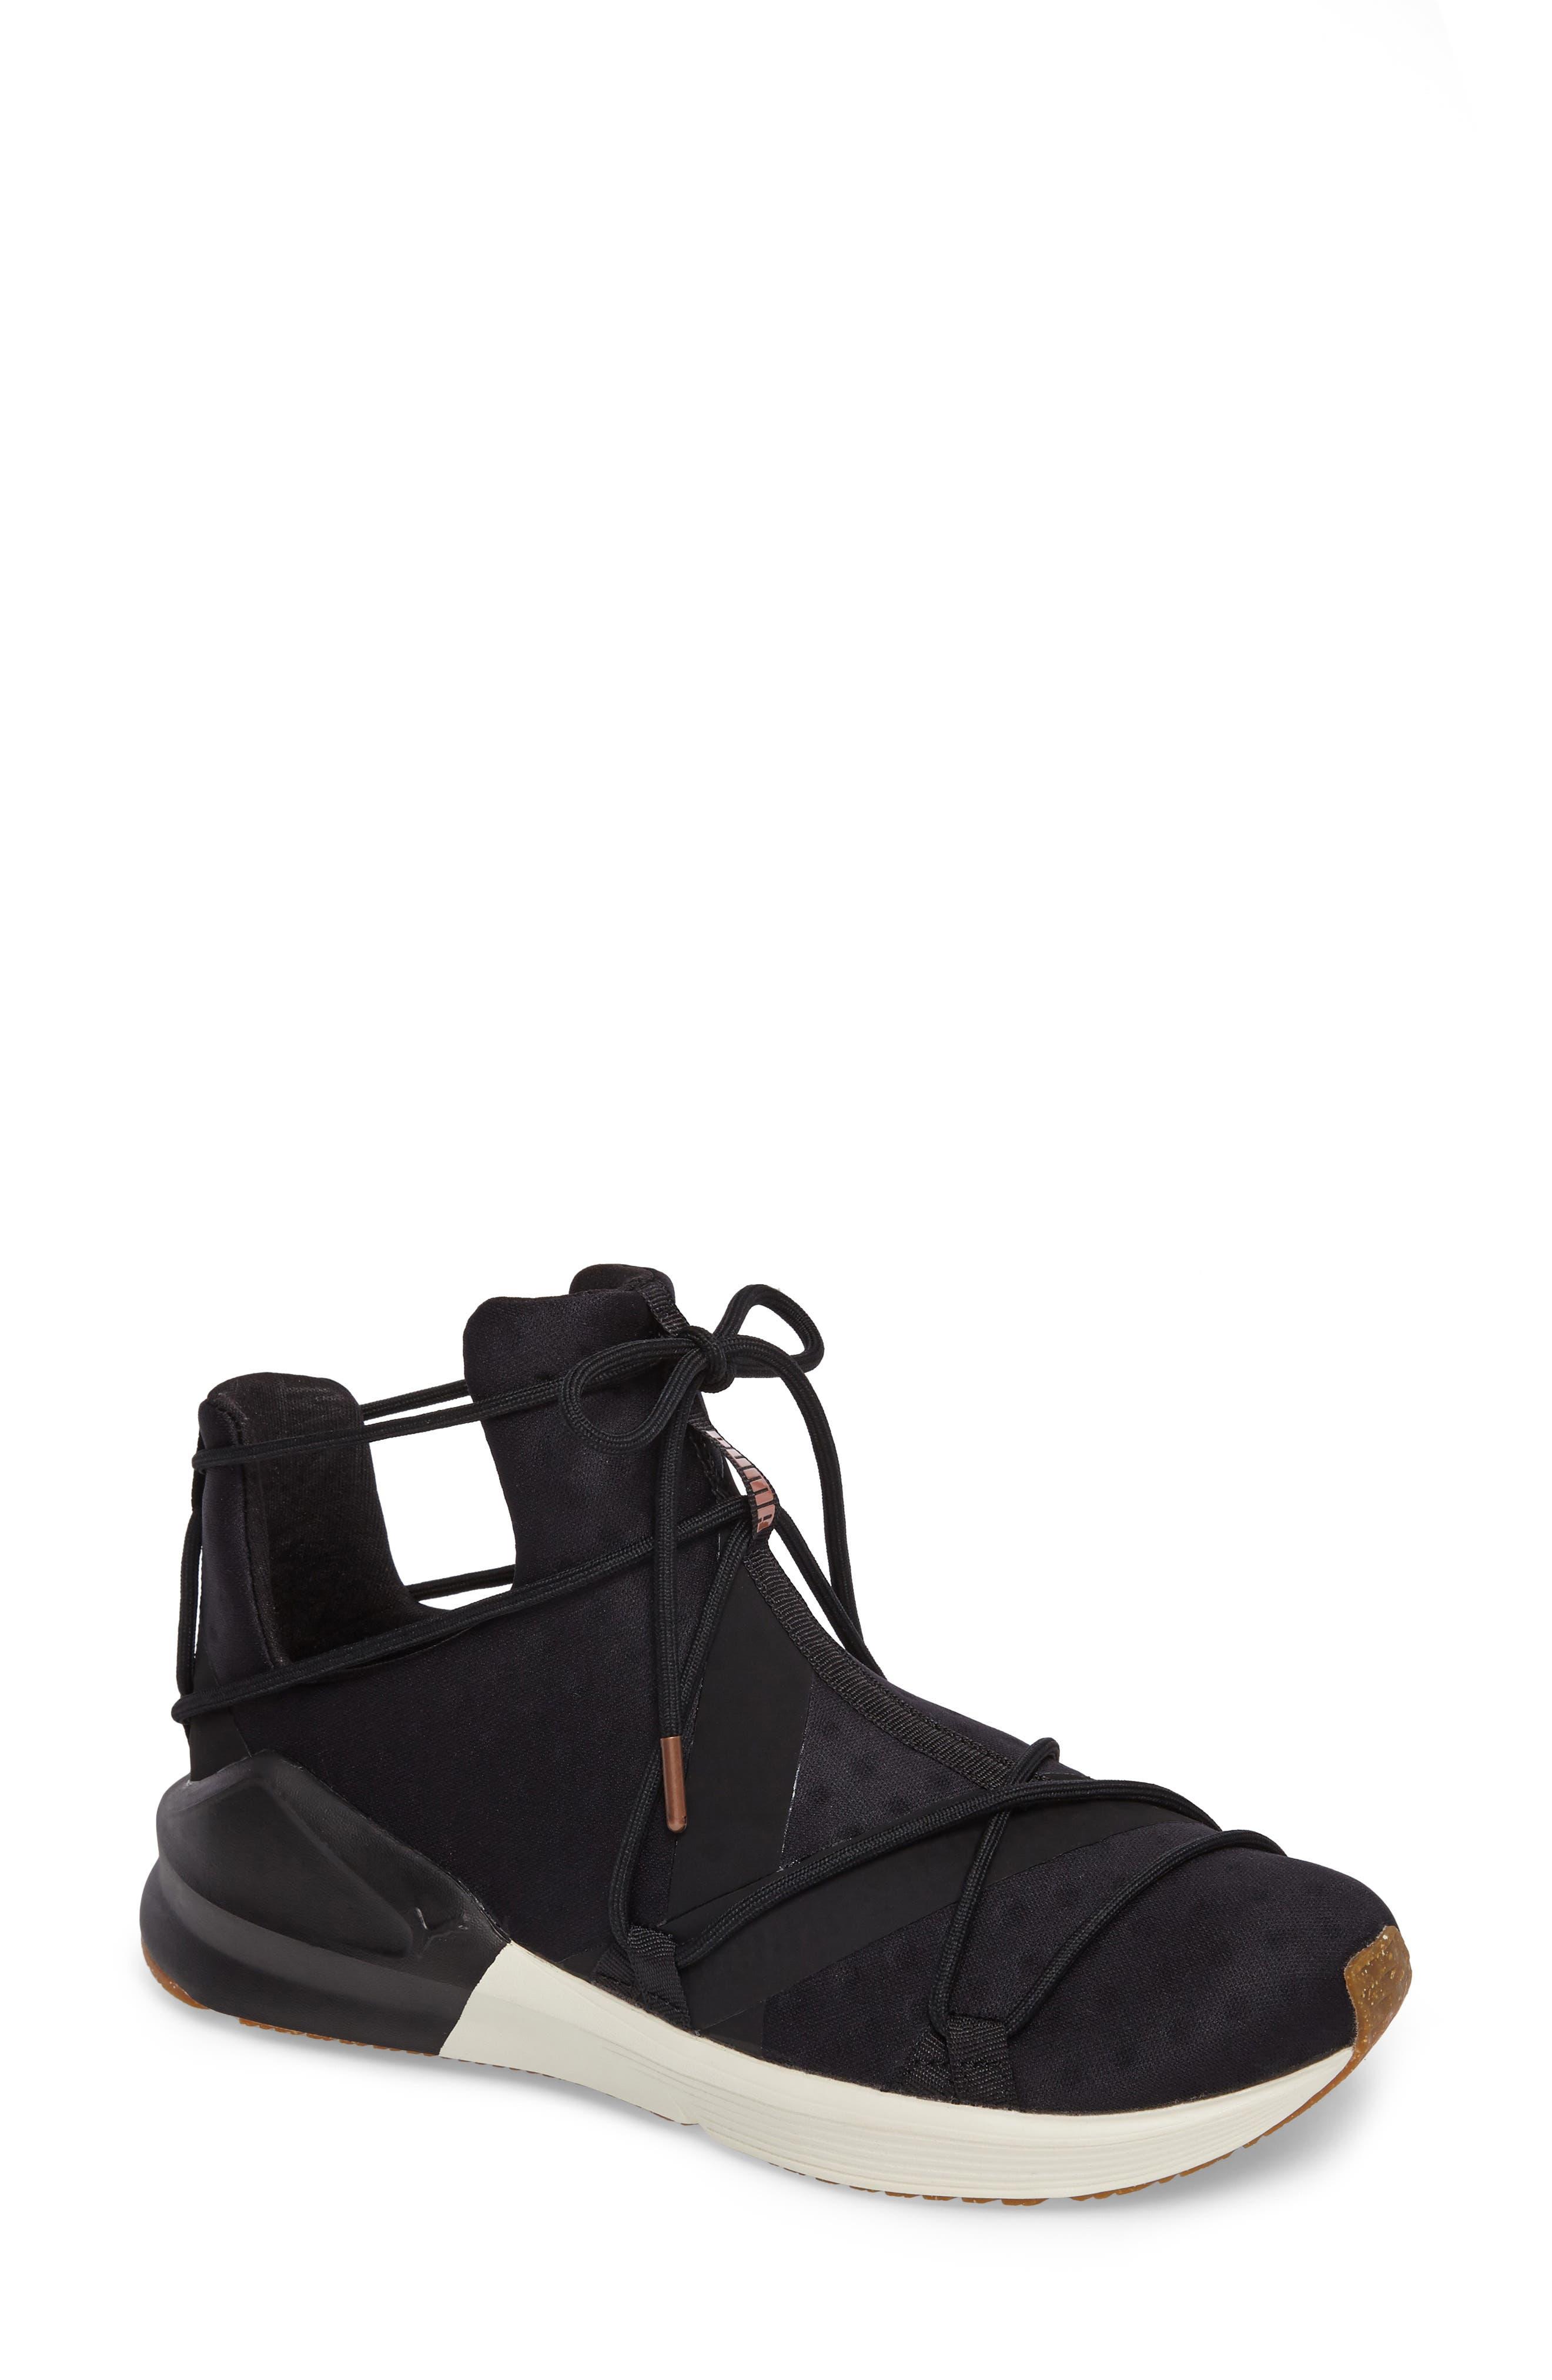 Alternate Image 1 Selected - PUMA Fierce Rope Training Sneaker (Women)